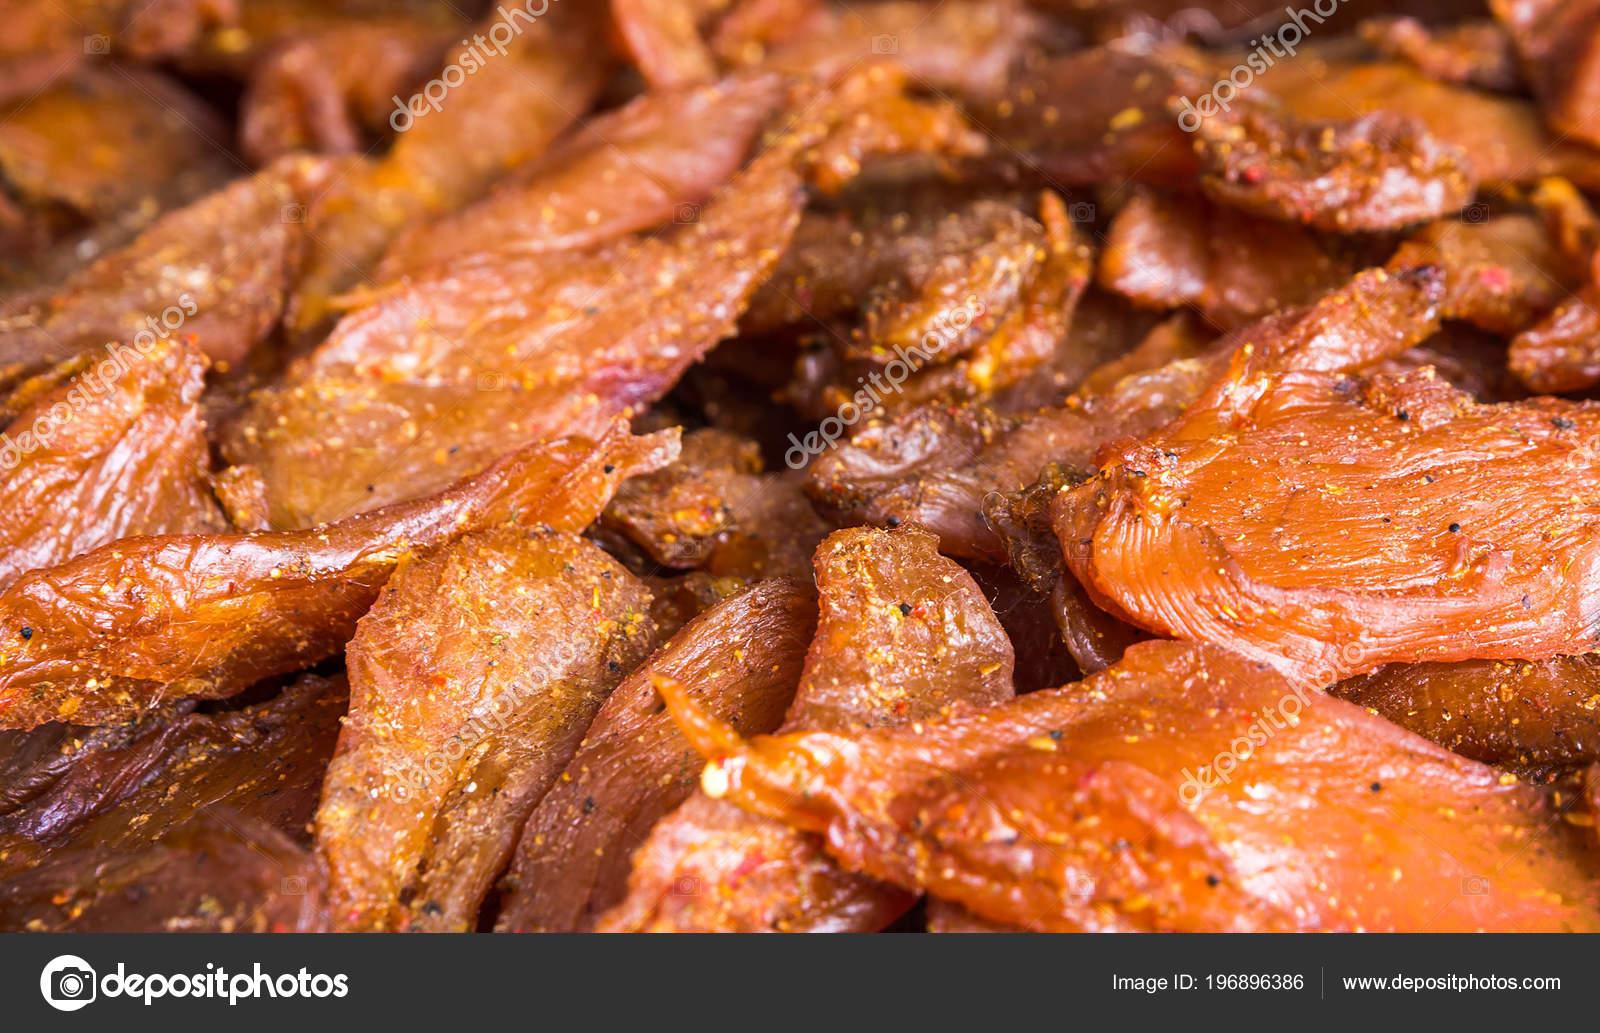 Chicken Jerky Pieces Fillet Soy Sauce Stock Photo C Seqoya